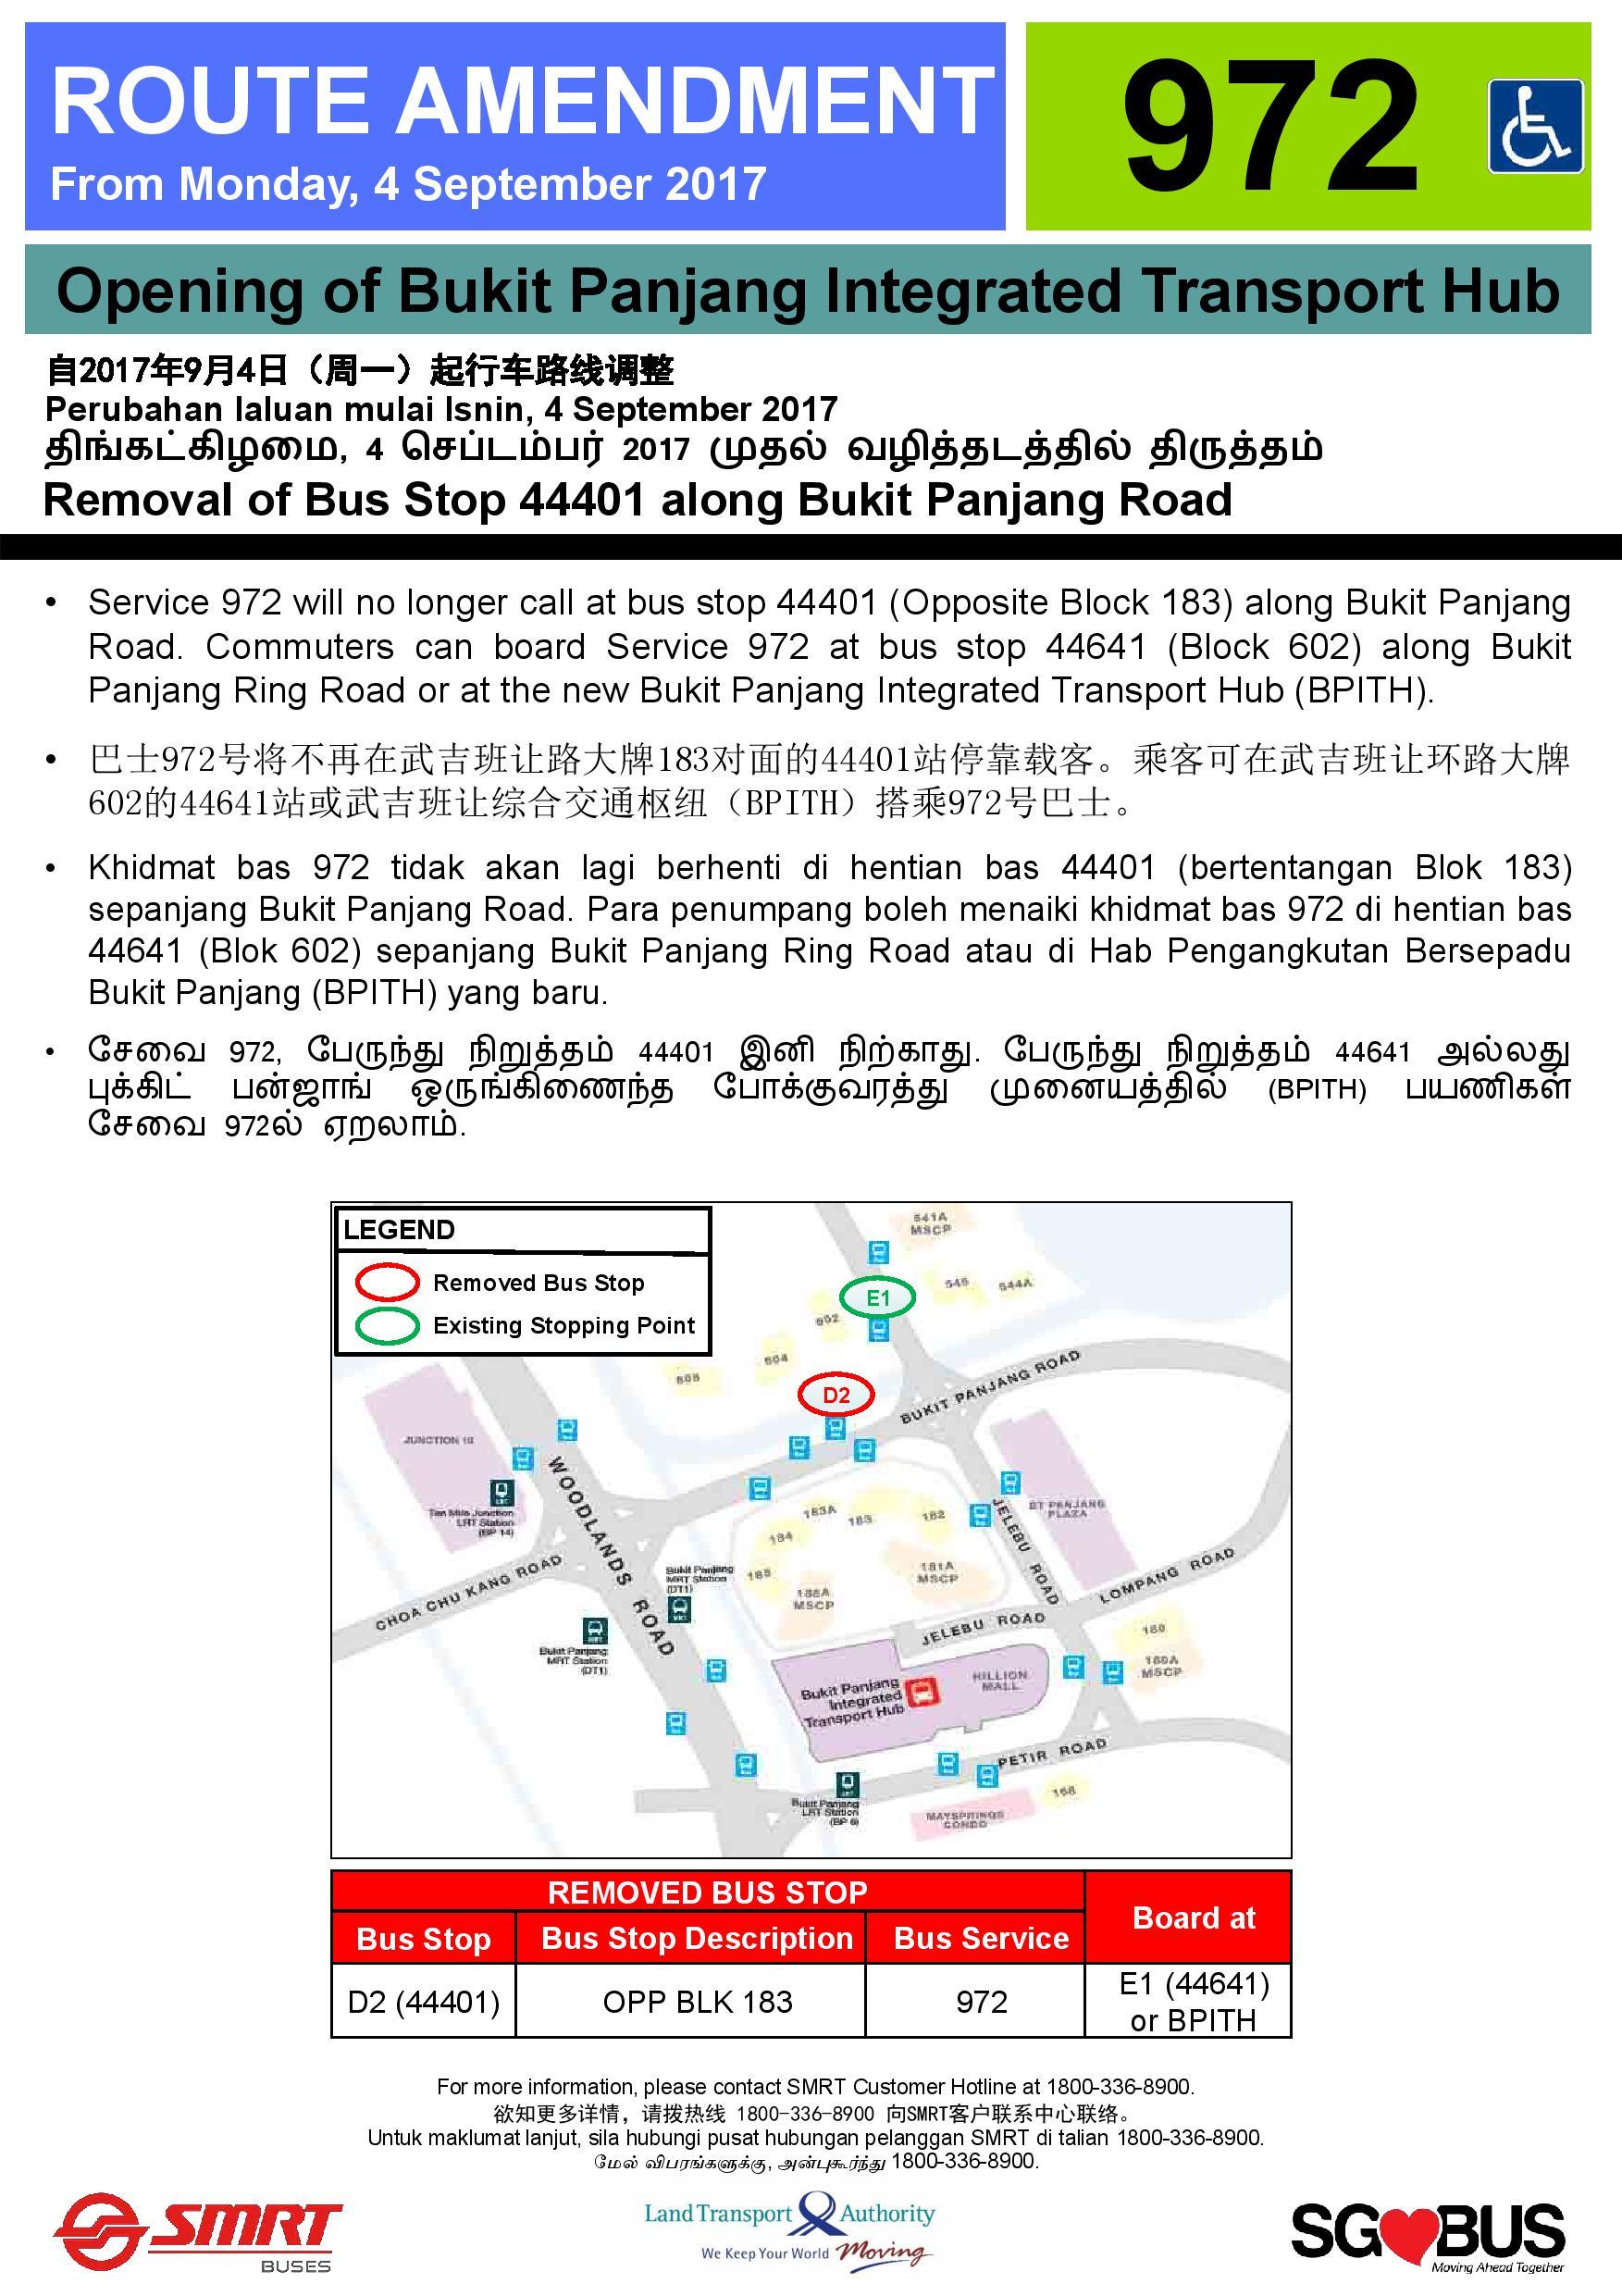 Bukit-Panjang-ITH-Opening-Bus-Stop-44401-Poster.jpg